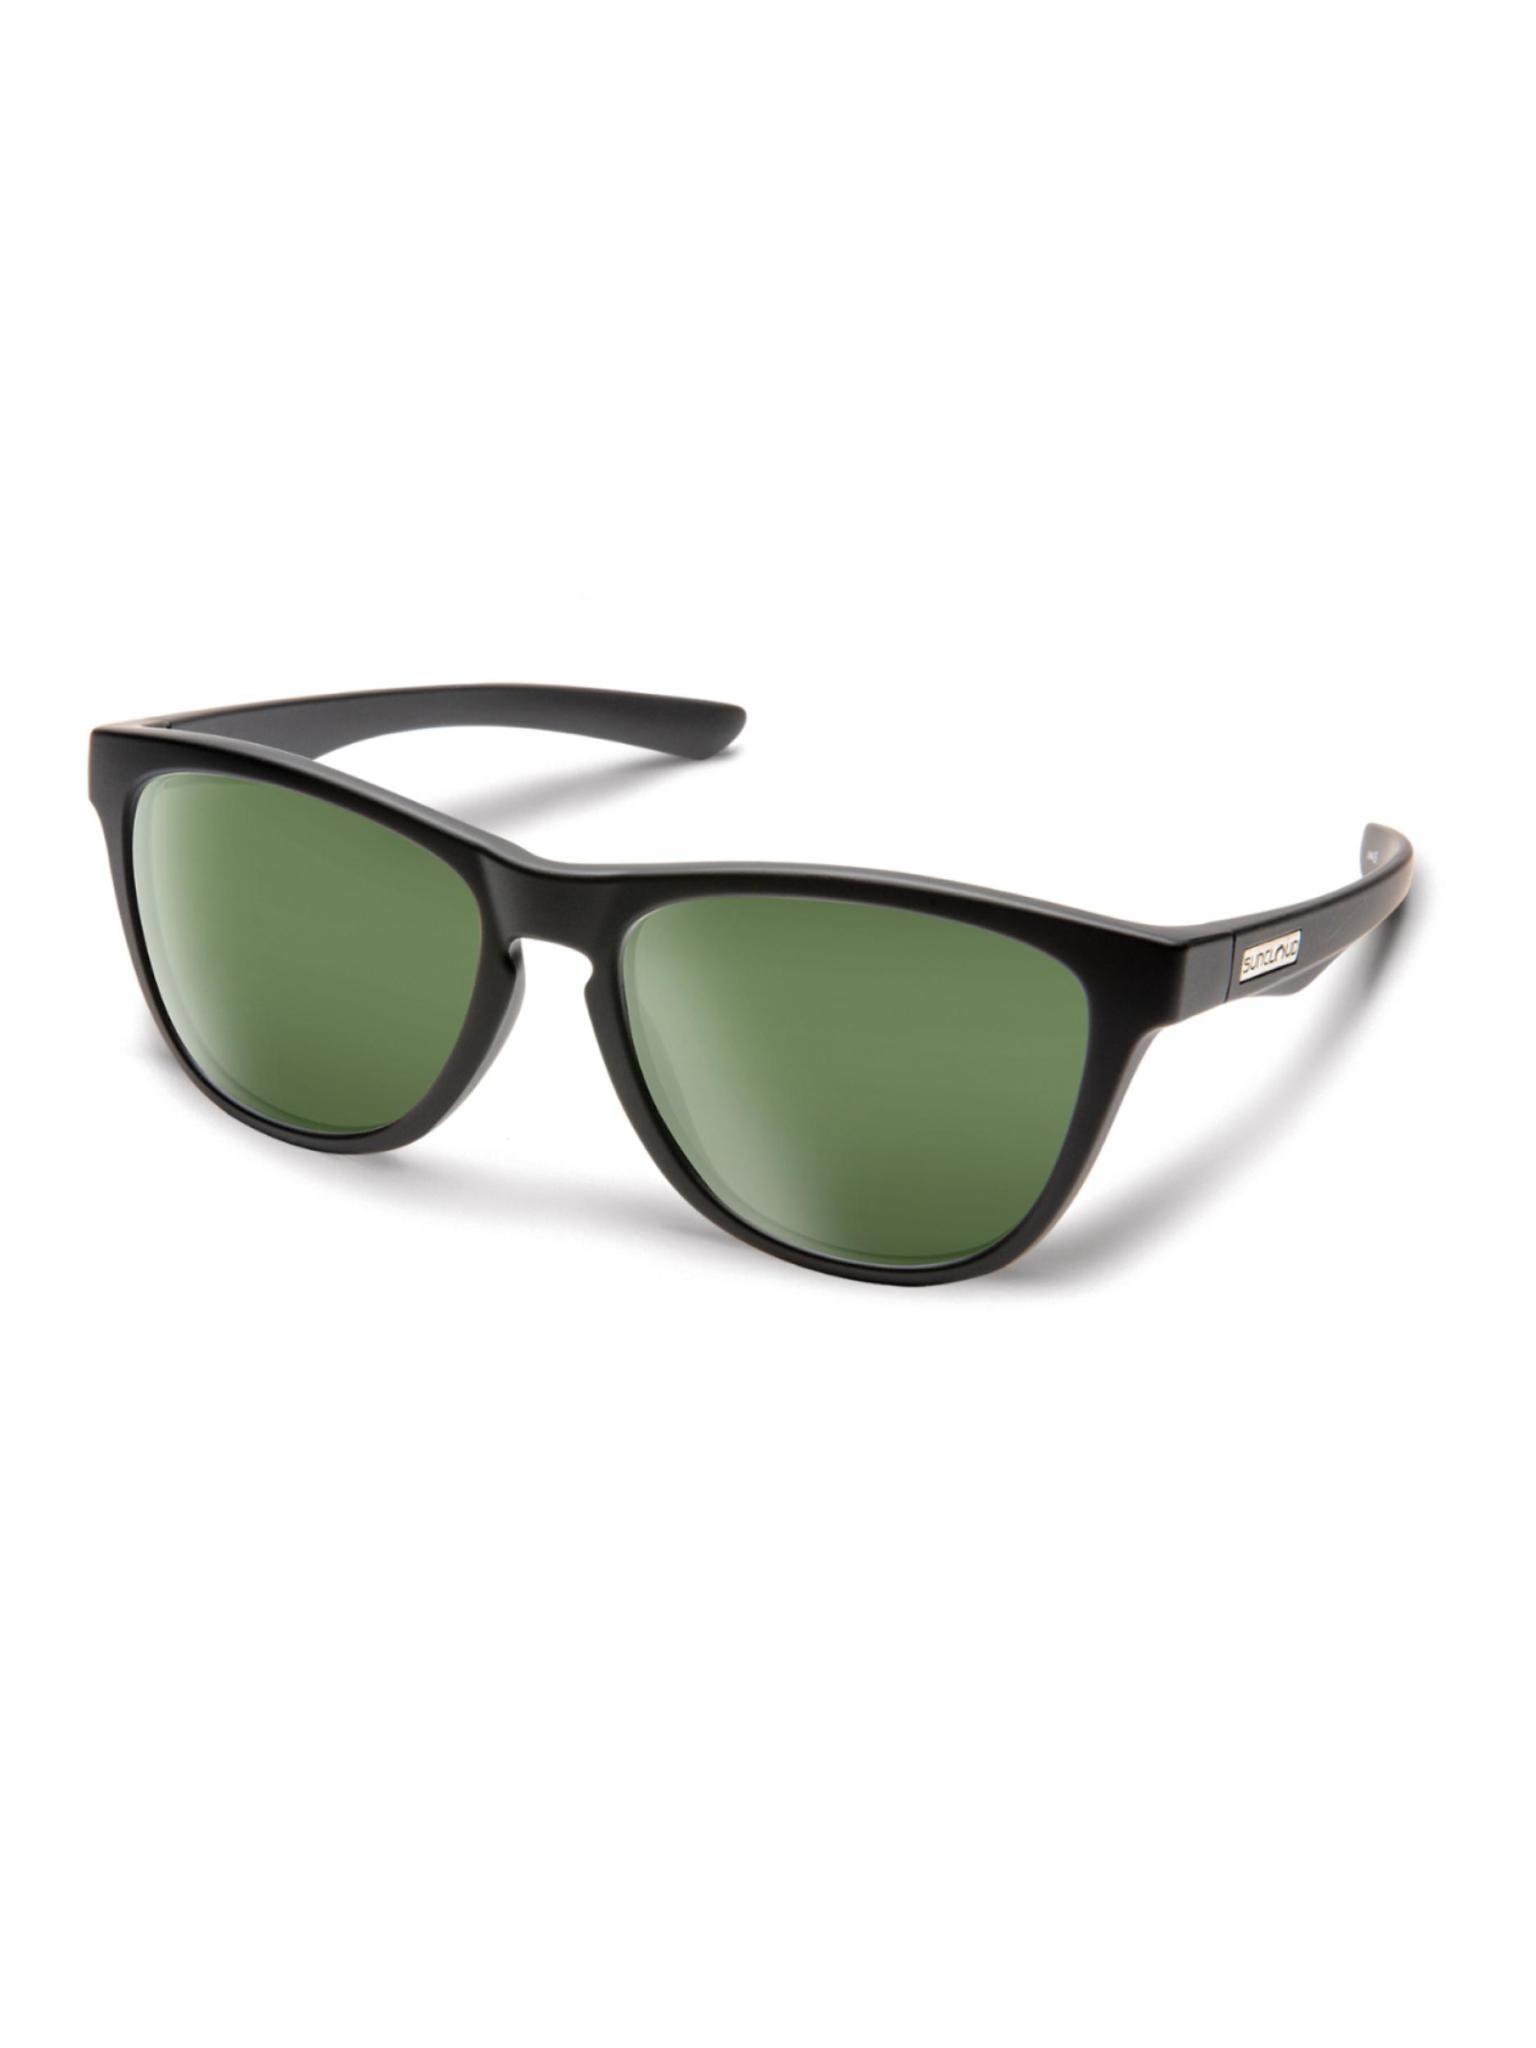 Topsail Matte Black Polarized Gray Green